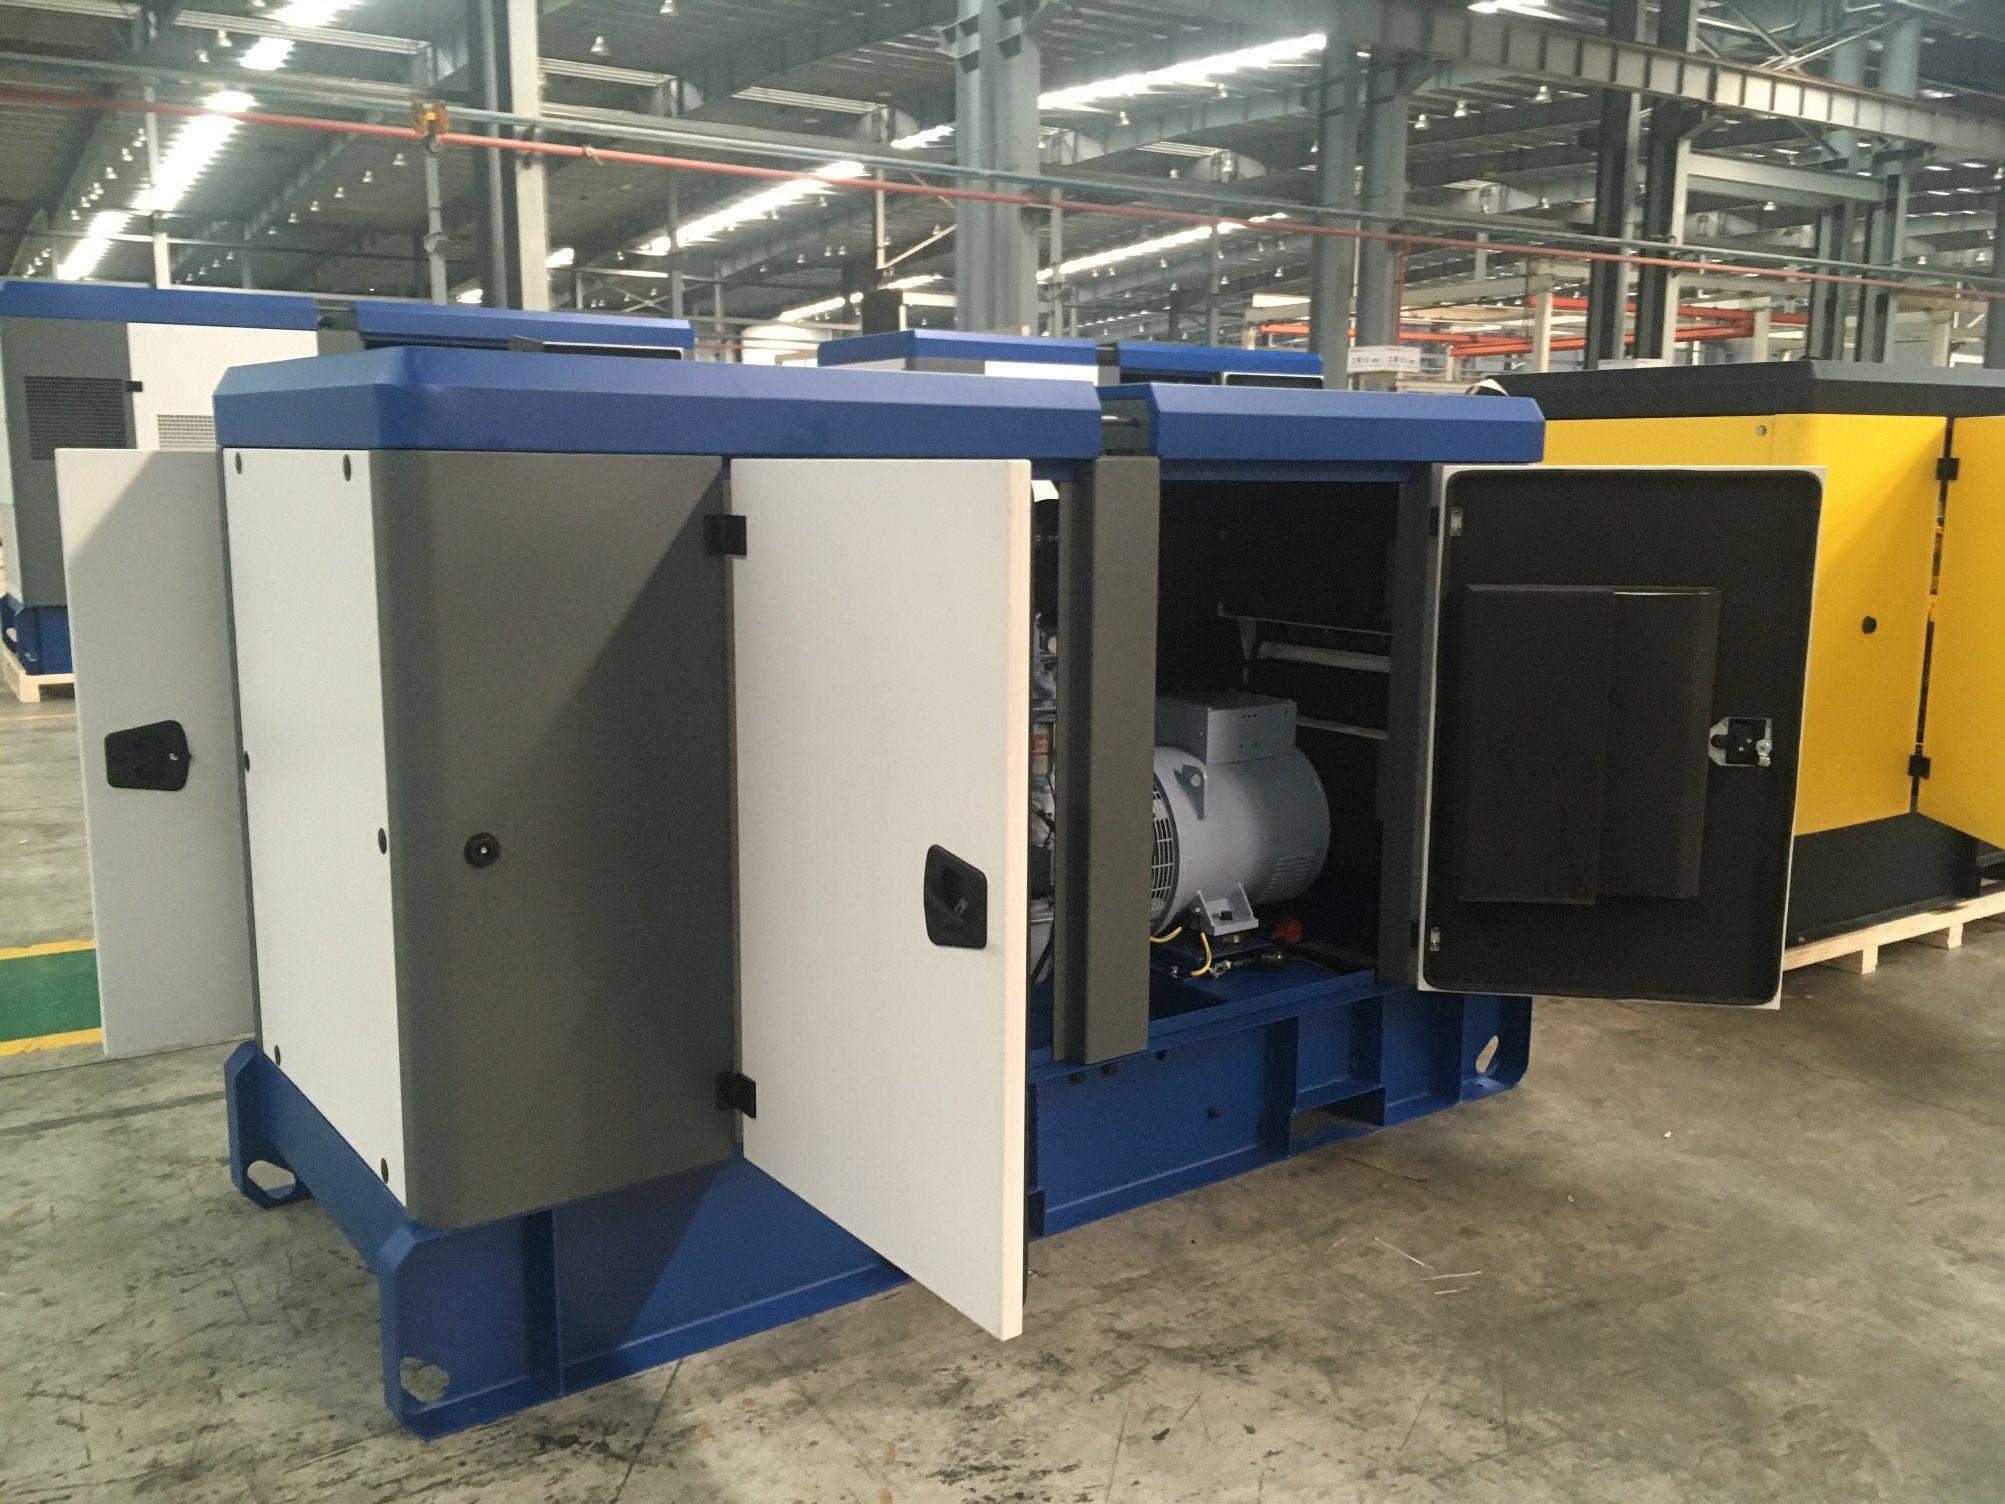 Kipor Knox Cummins Diesel Generator Stamford Alternator Dse Control Ks110c-S